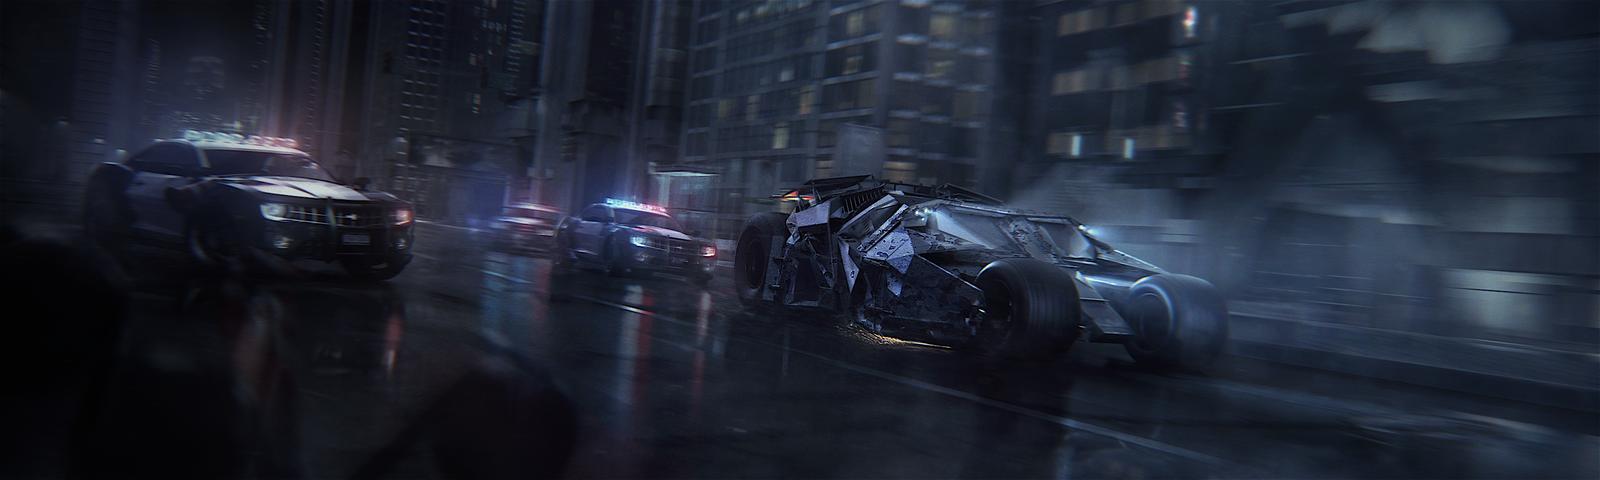 Dark Knight by Drake1024